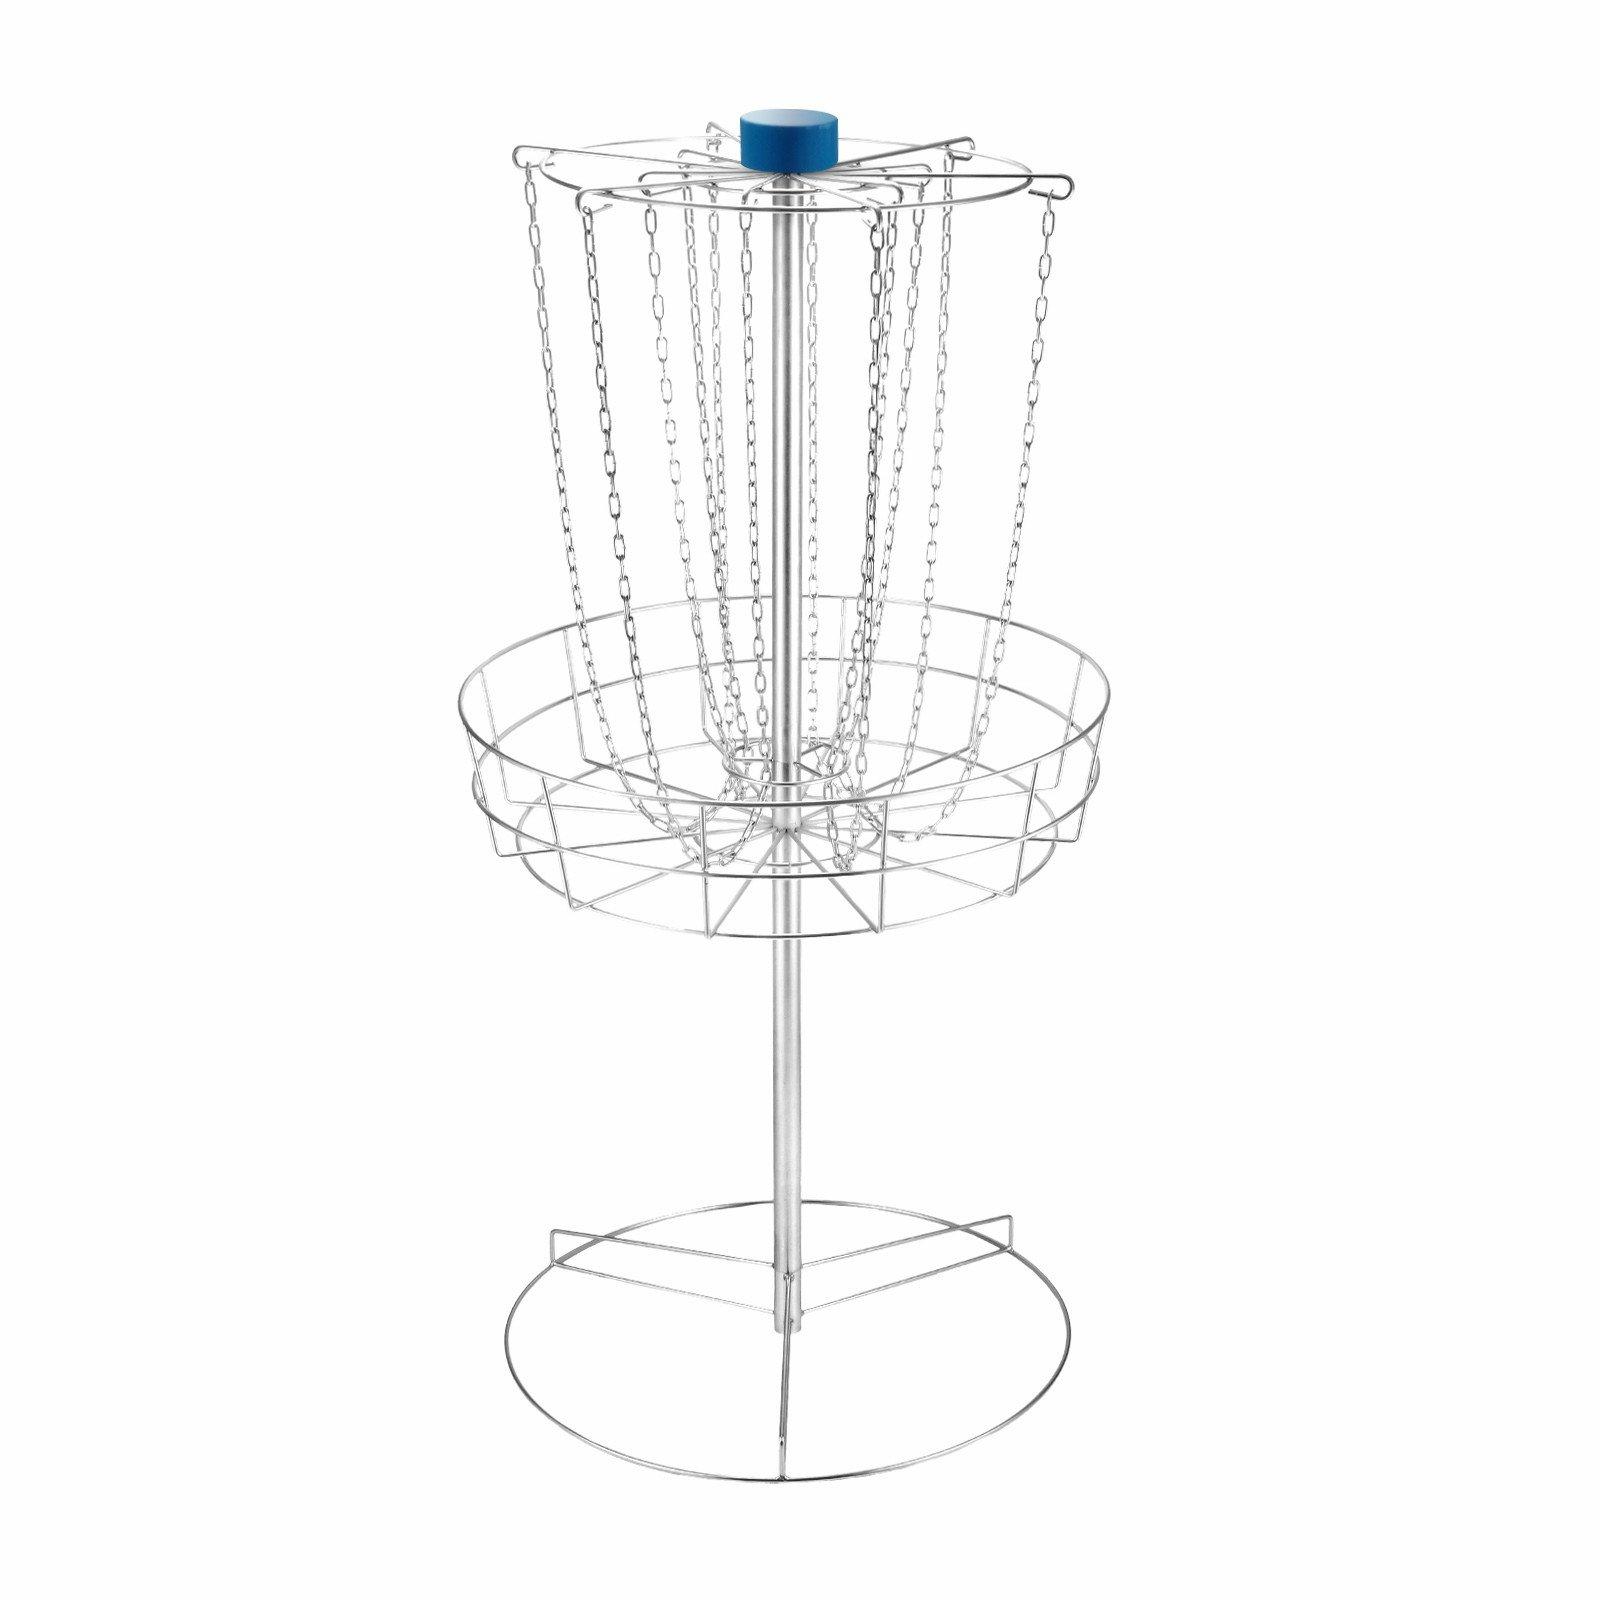 "Popsport Disc Golf Basket 55 or 56.5 Height Portable Disc Golf Basket with Double Chains Portable Practice Target Steel Frisbee Hole Disc Golf Target for Disc Golfers (56.5"" Disc Golf Basket)"